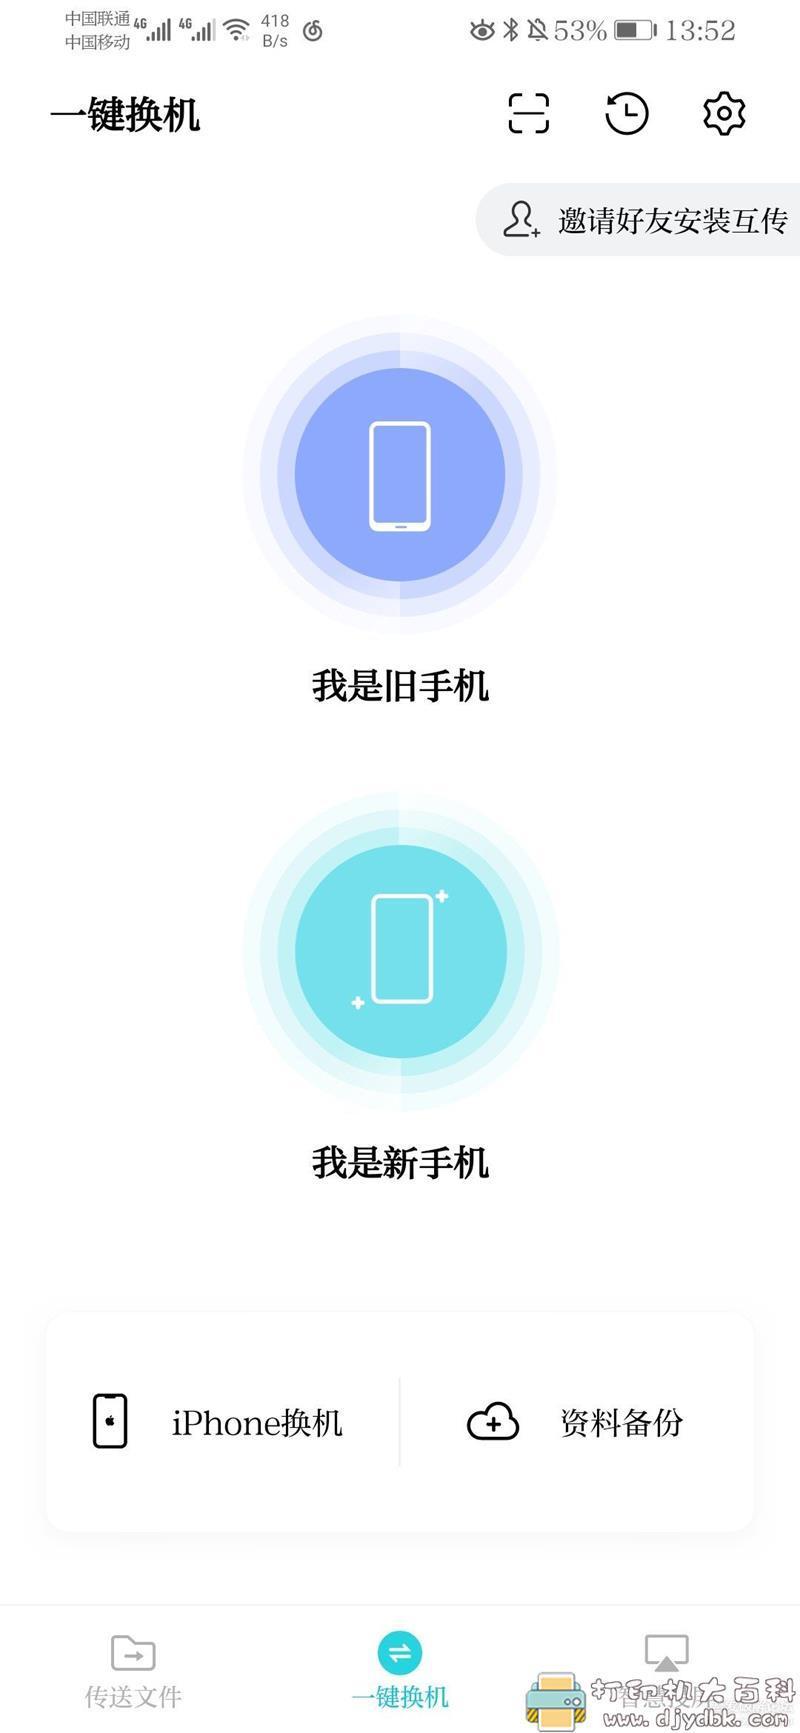 [Android]手机电脑互传文件工具 Easyshare_android_4.3.3.3图片 No.1